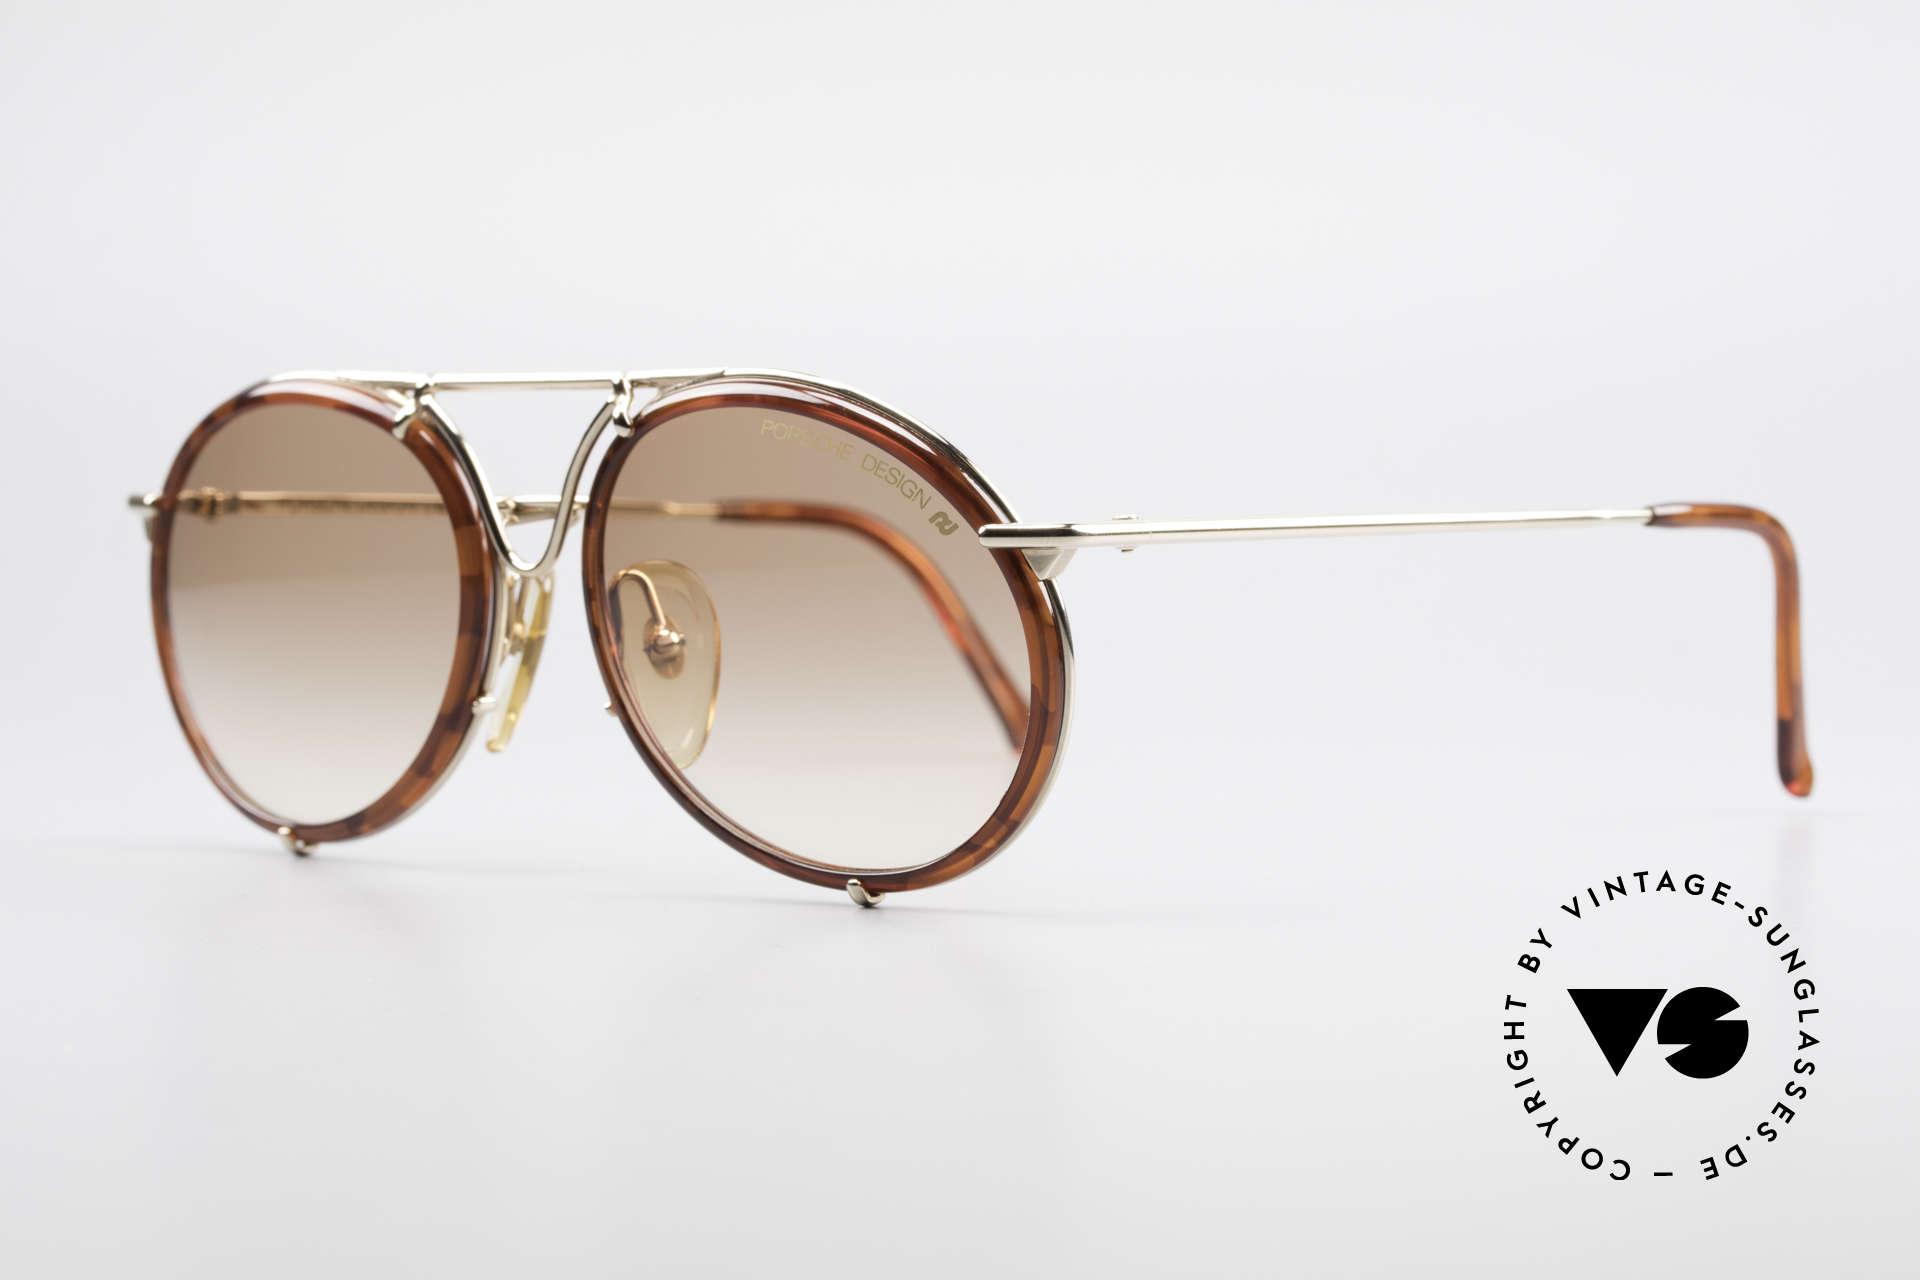 Porsche 5661 Classic 90's Sunglasses Round, best craftsmanship & top materials; 100% UV protec., Made for Men and Women